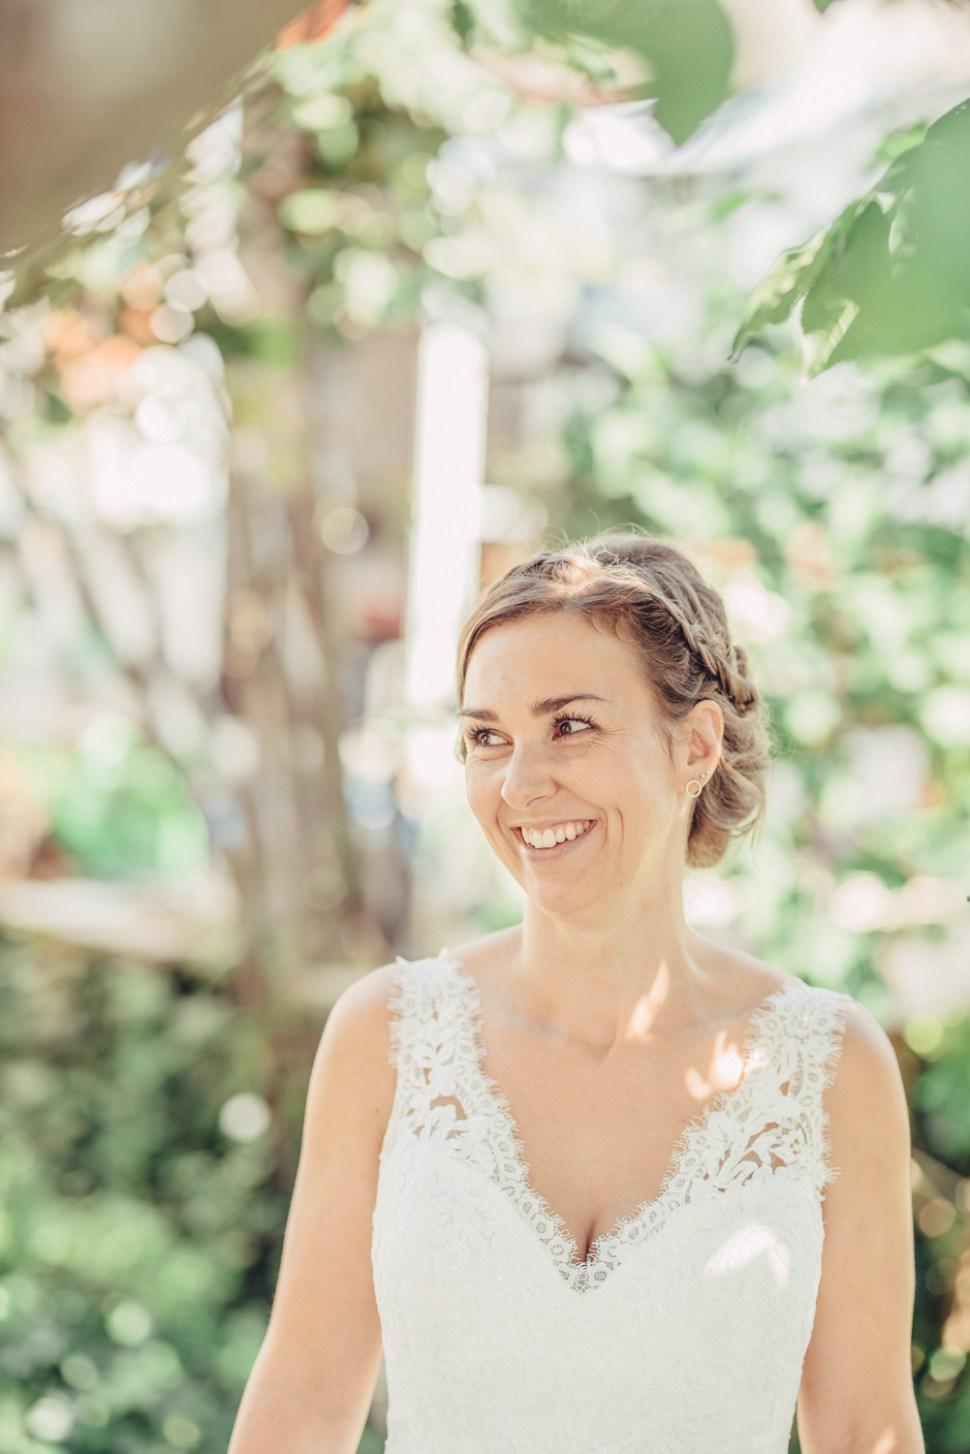 weddingaugust2018luminoxx723445-31